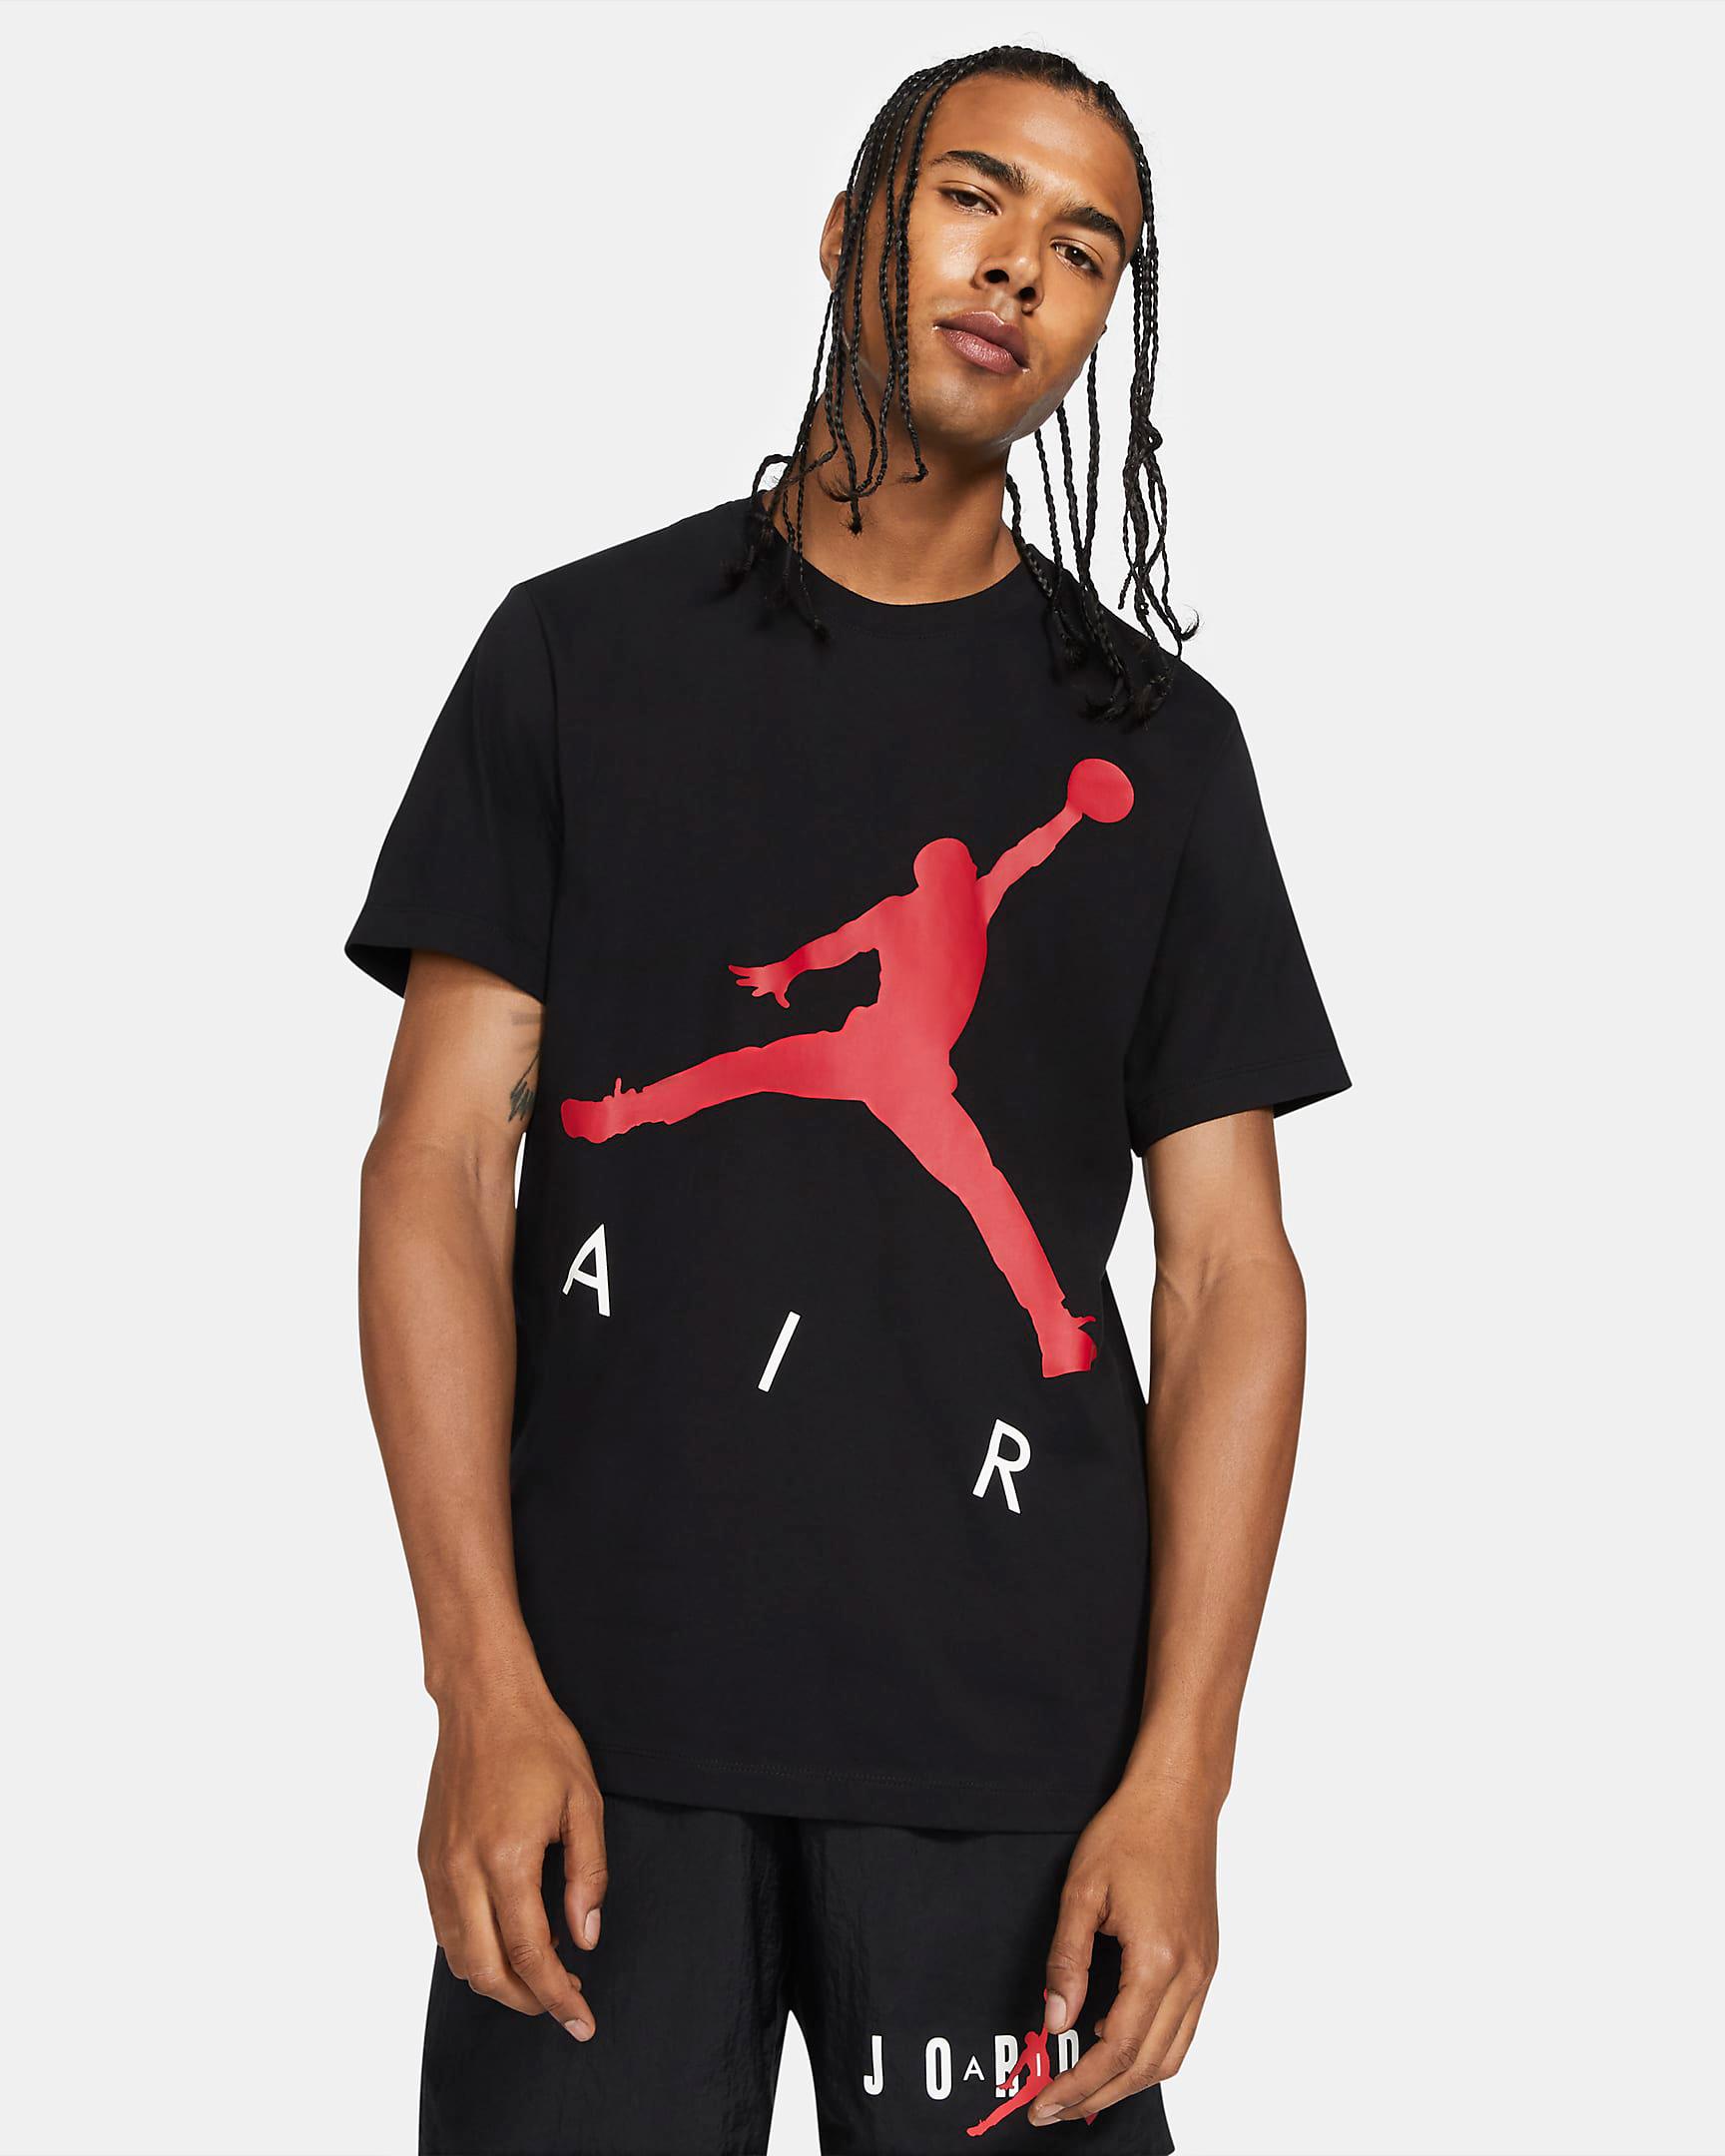 jordan-jumpman-air-shirt-black-red-white